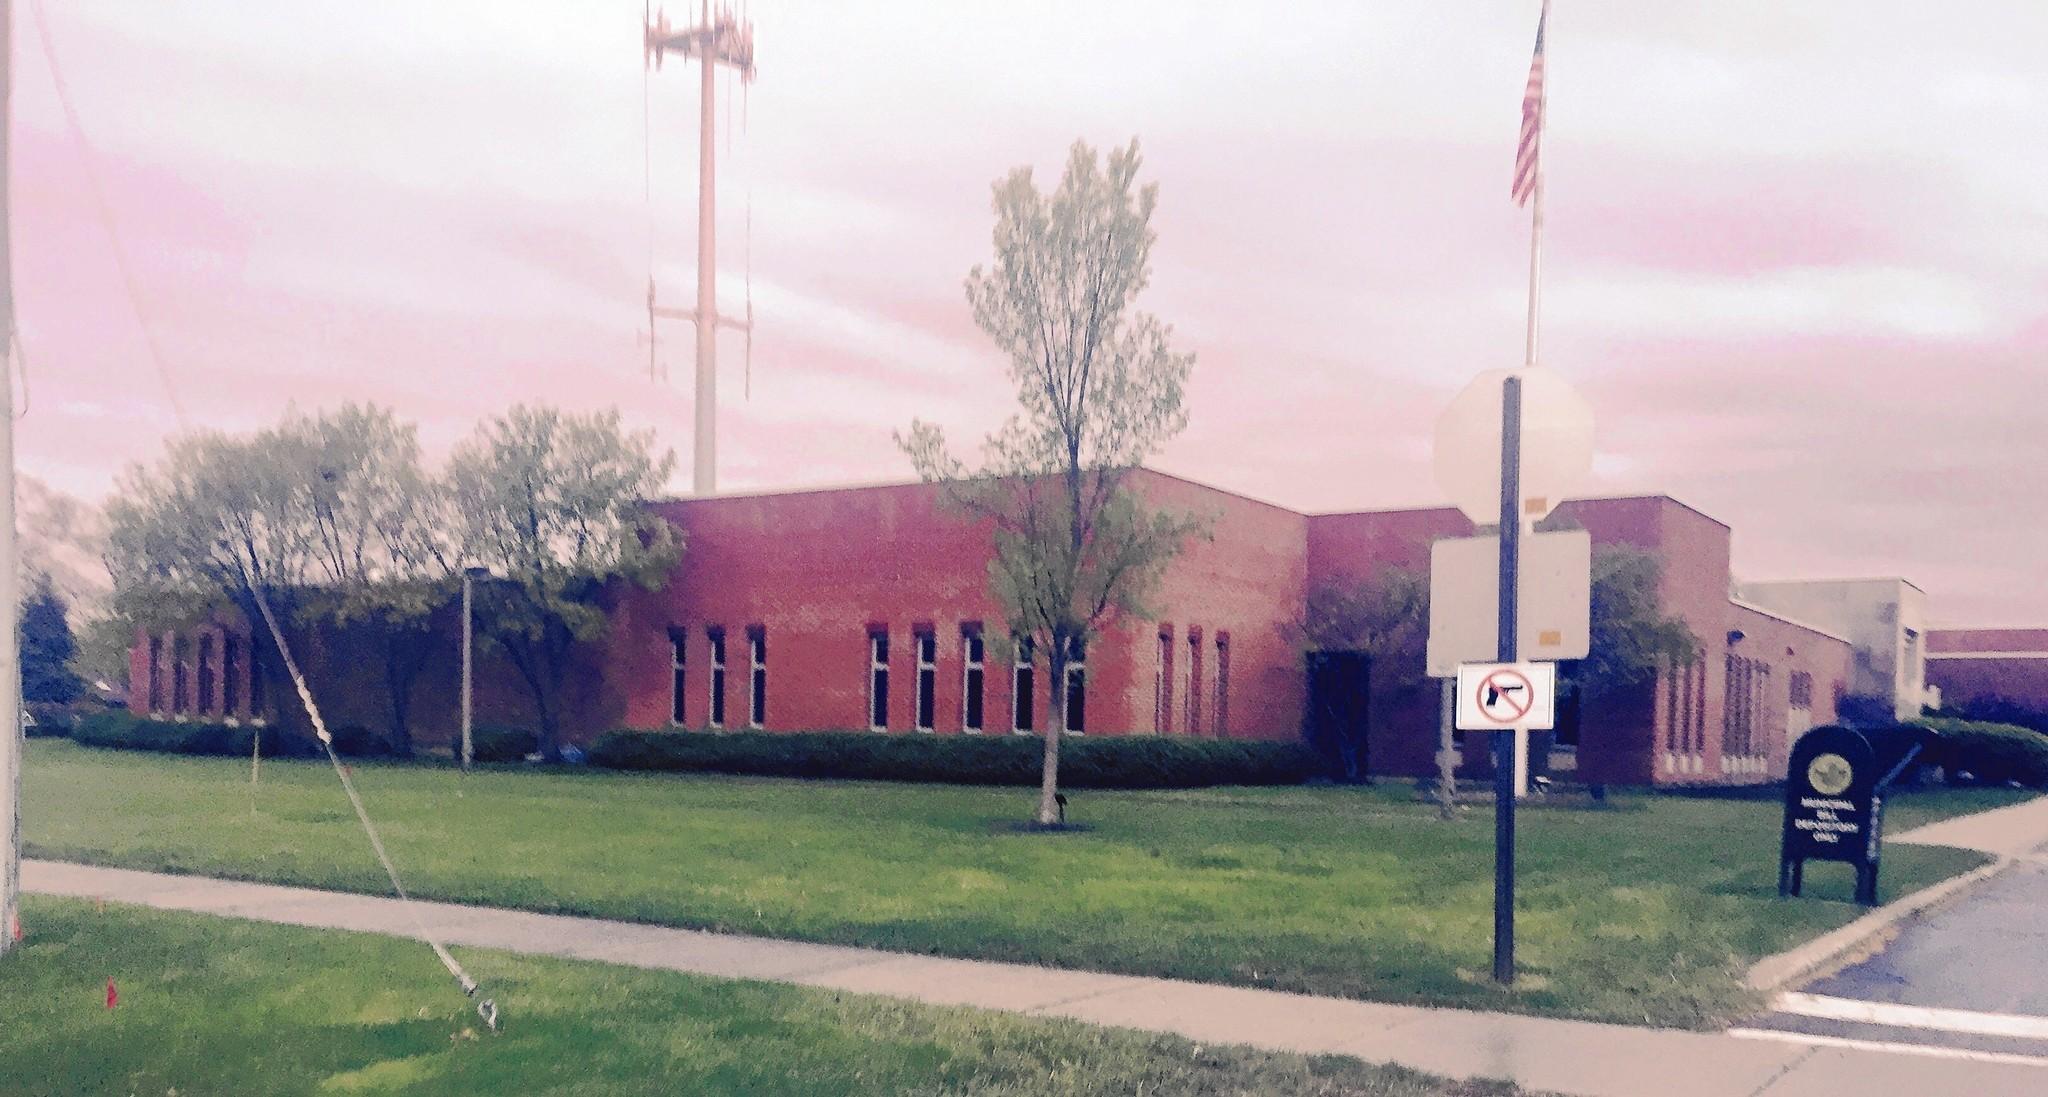 northbrook building department